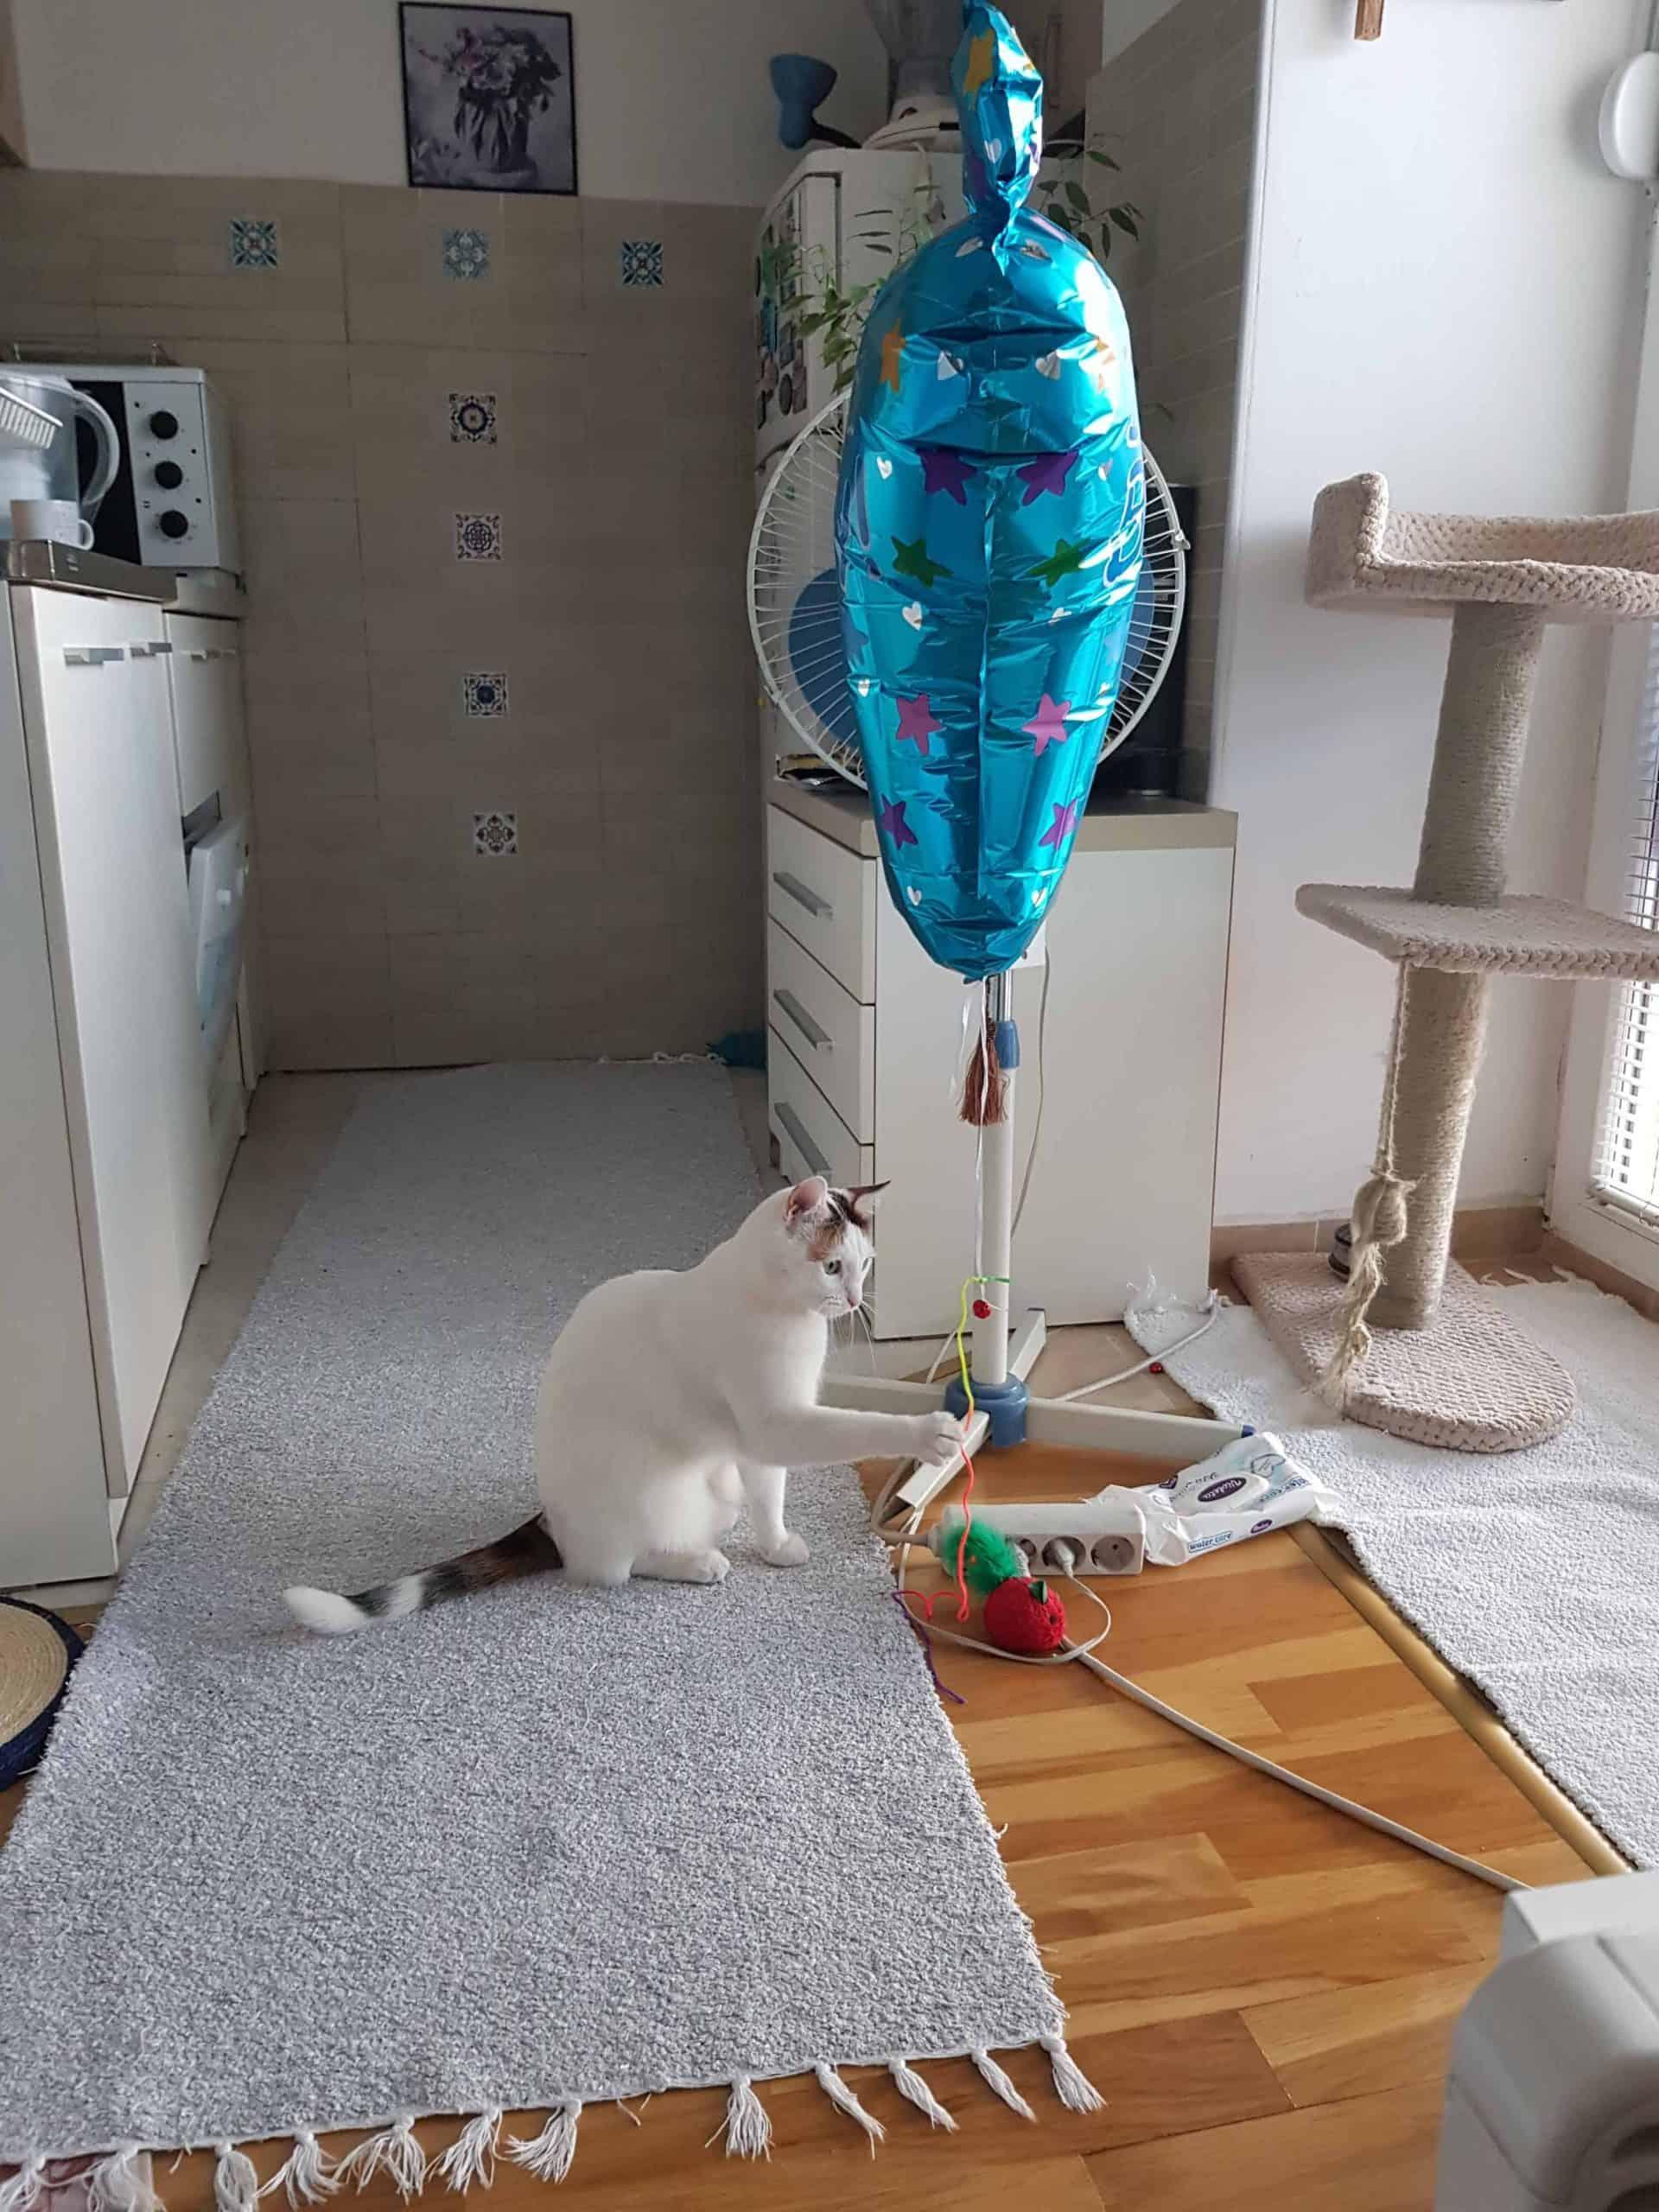 helium balloon toy